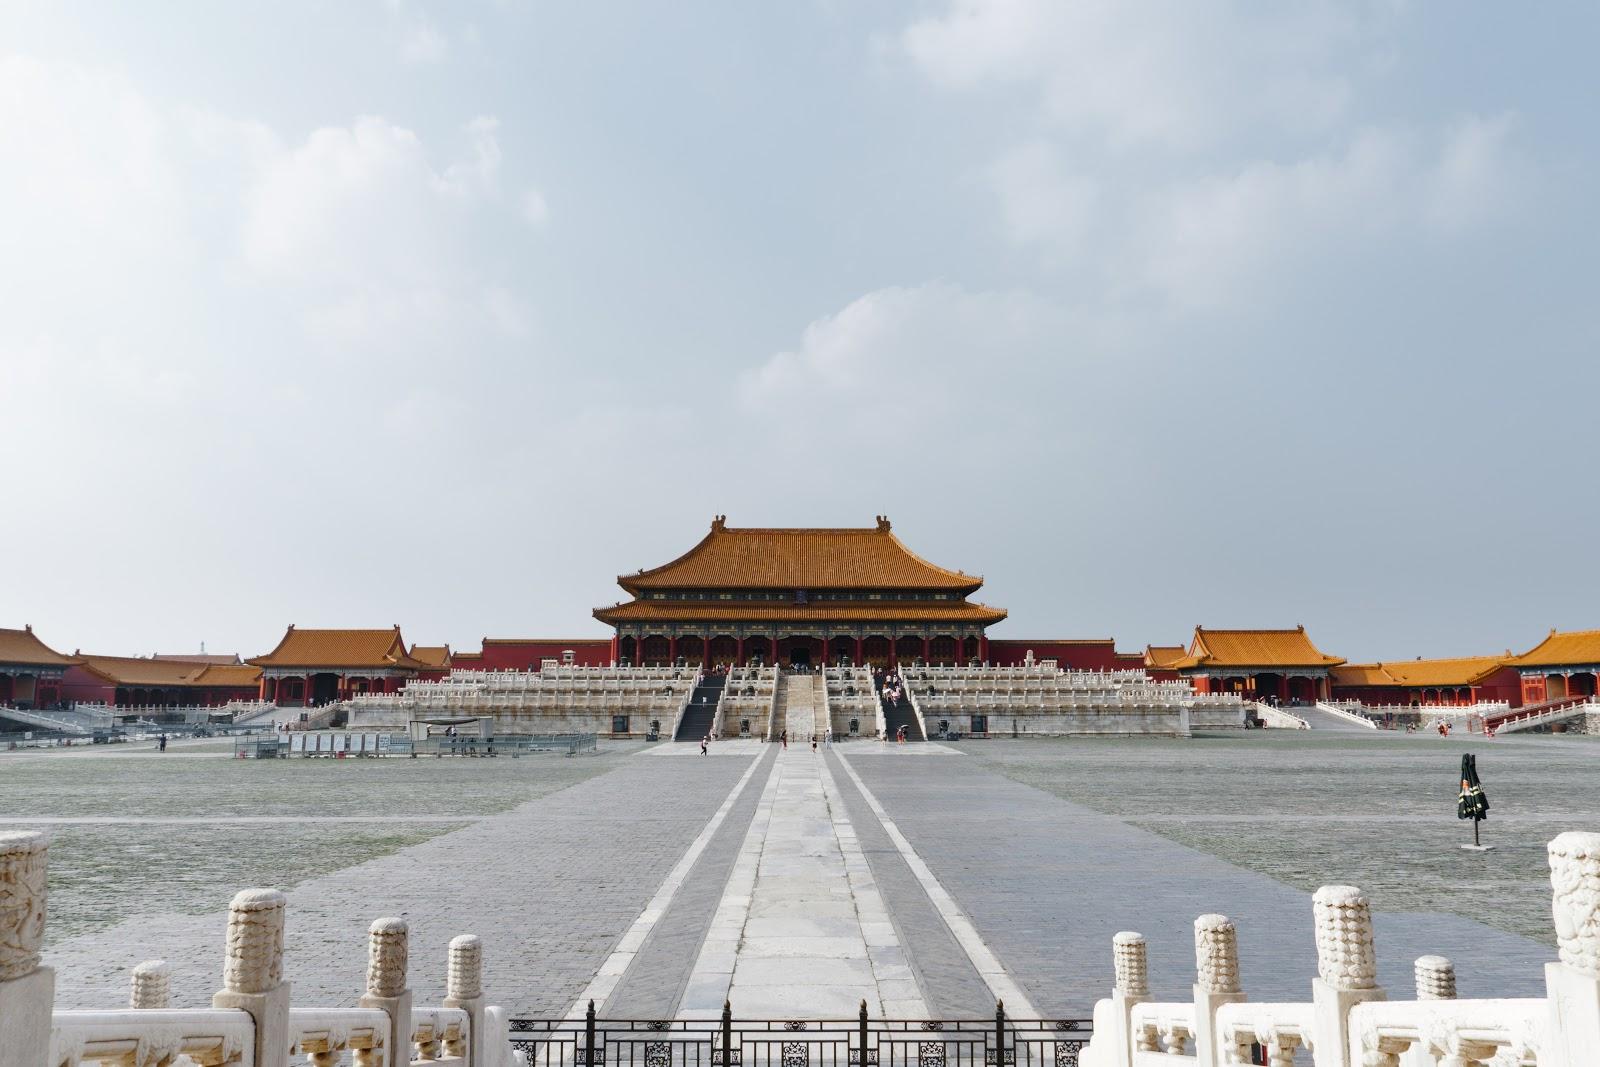 The Forbidden City   Source: unsplash.com